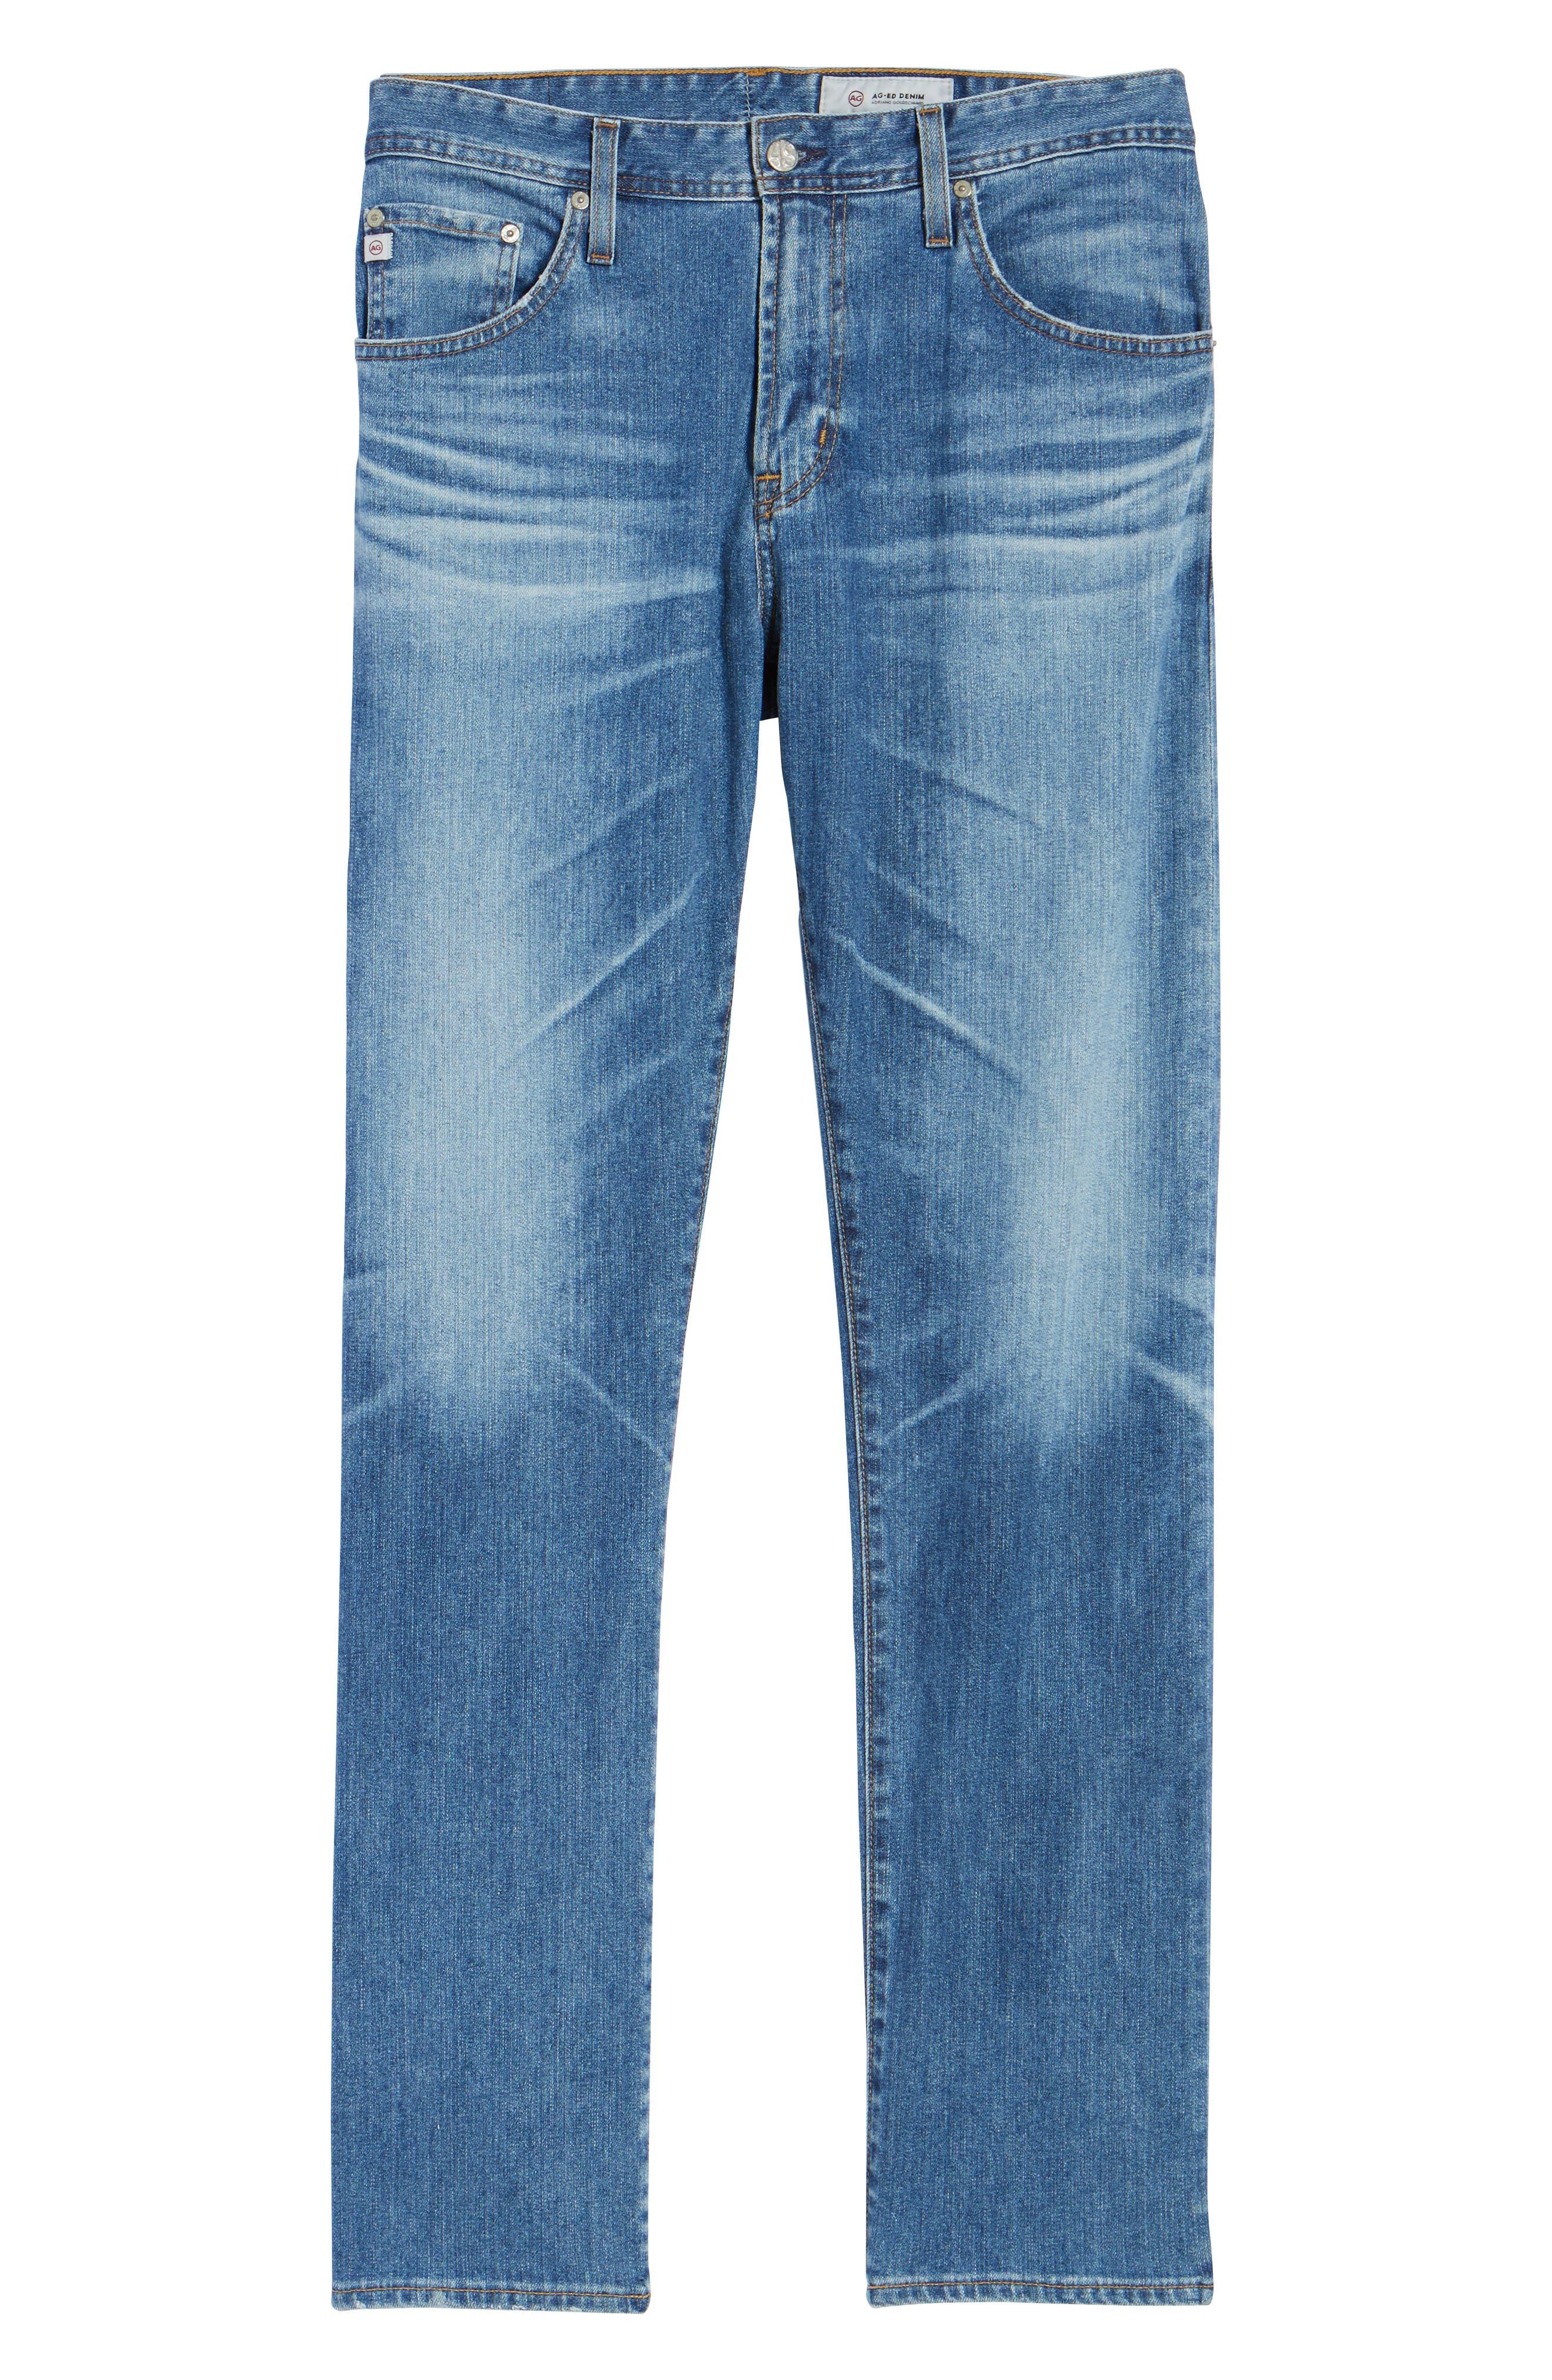 Ives Straight Leg Jeans,                             Alternate thumbnail 6, color,                             16 Years Broken Ground